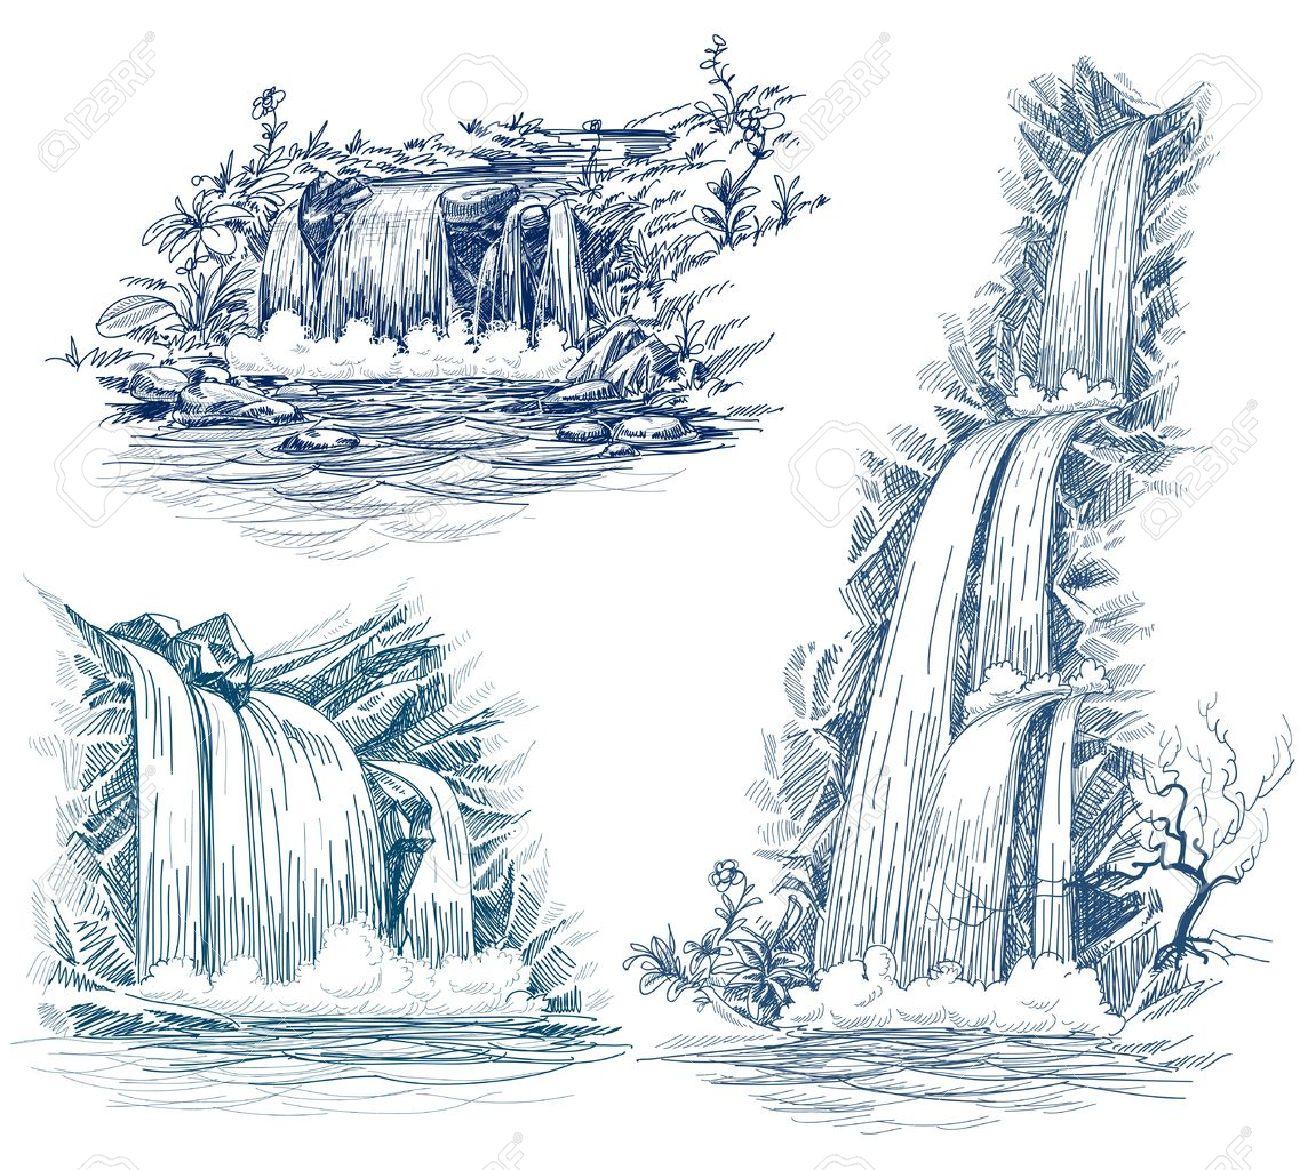 Water falls drawing Stock Vector - 13941250